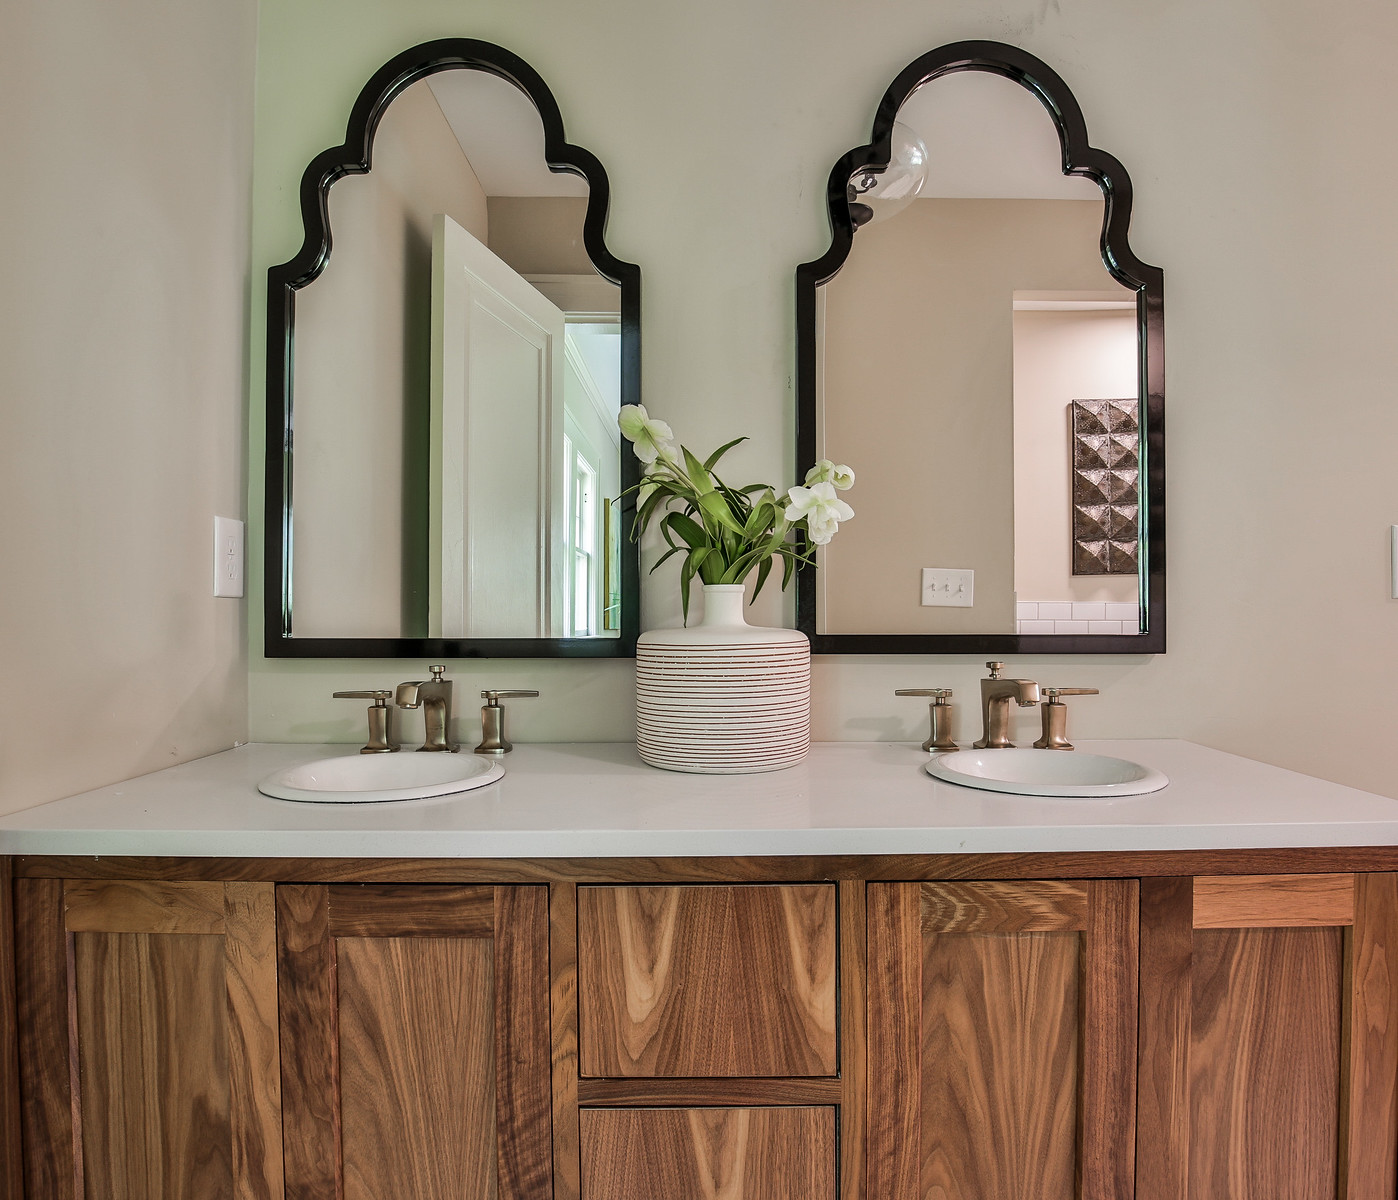 Vanity/Sinks/Tub/Bath Hardware: Kohler